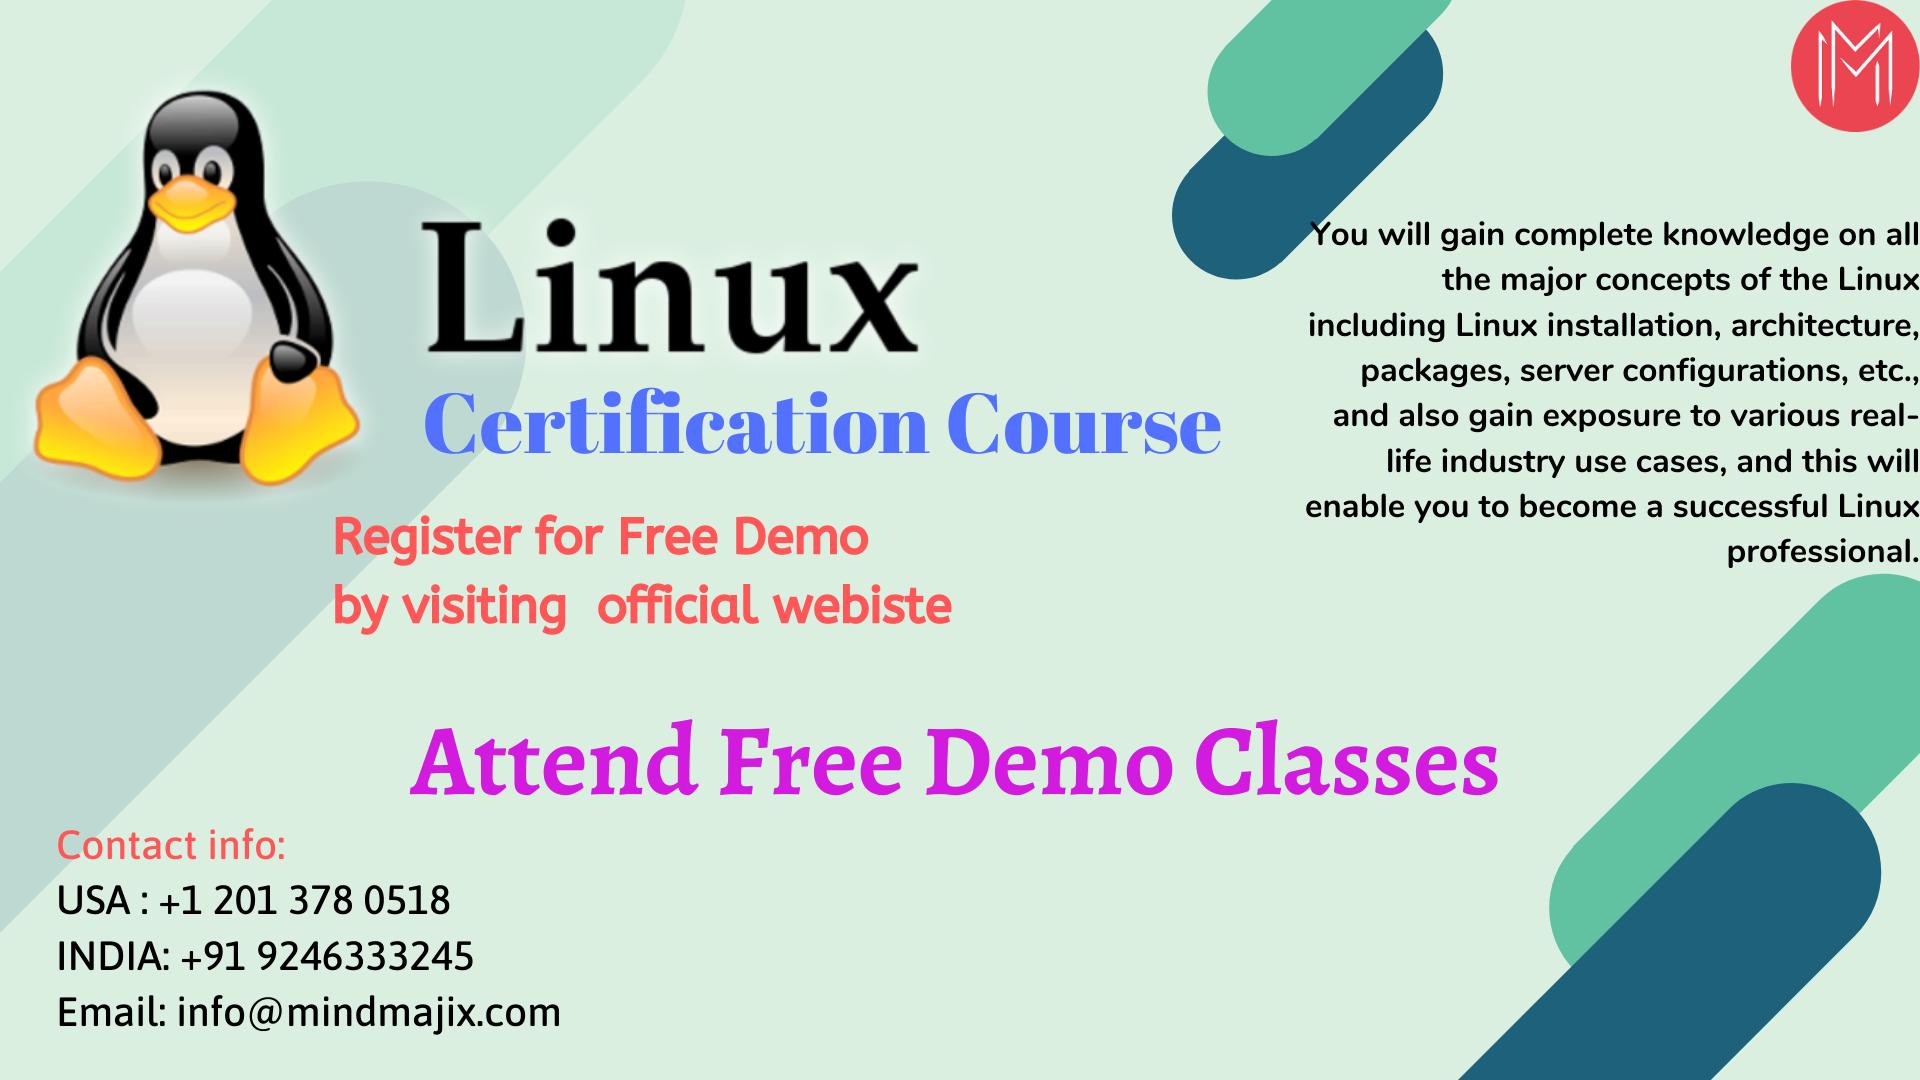 Linux Webinar Free Online Event Online Event Online Training Webinar